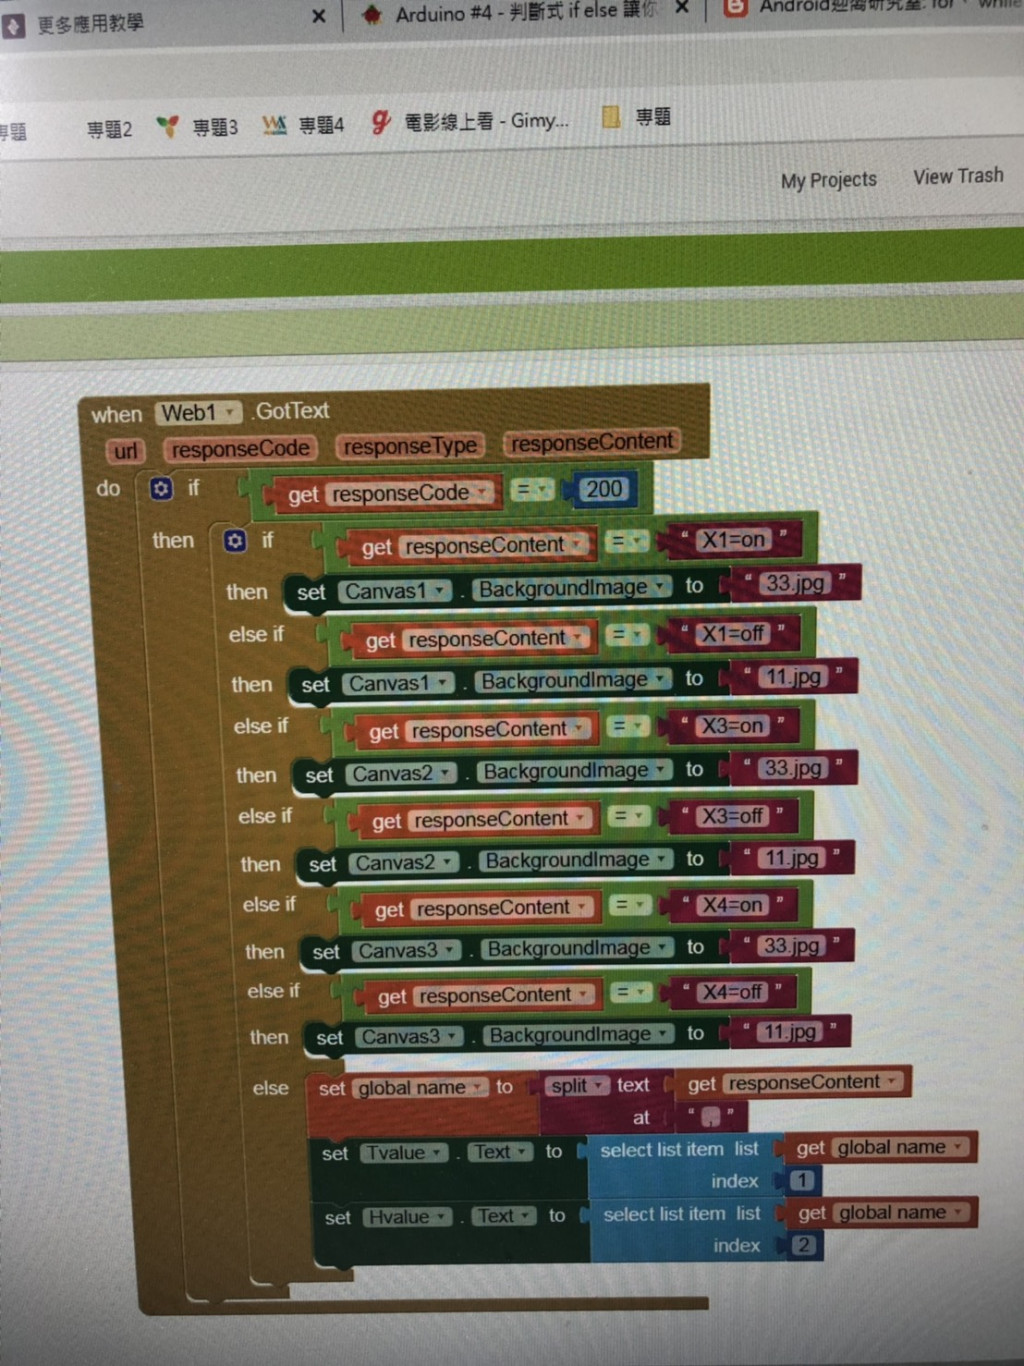 https://ithelp.ithome.com.tw/upload/images/20191225/20123502XoN5LySGM1.jpg